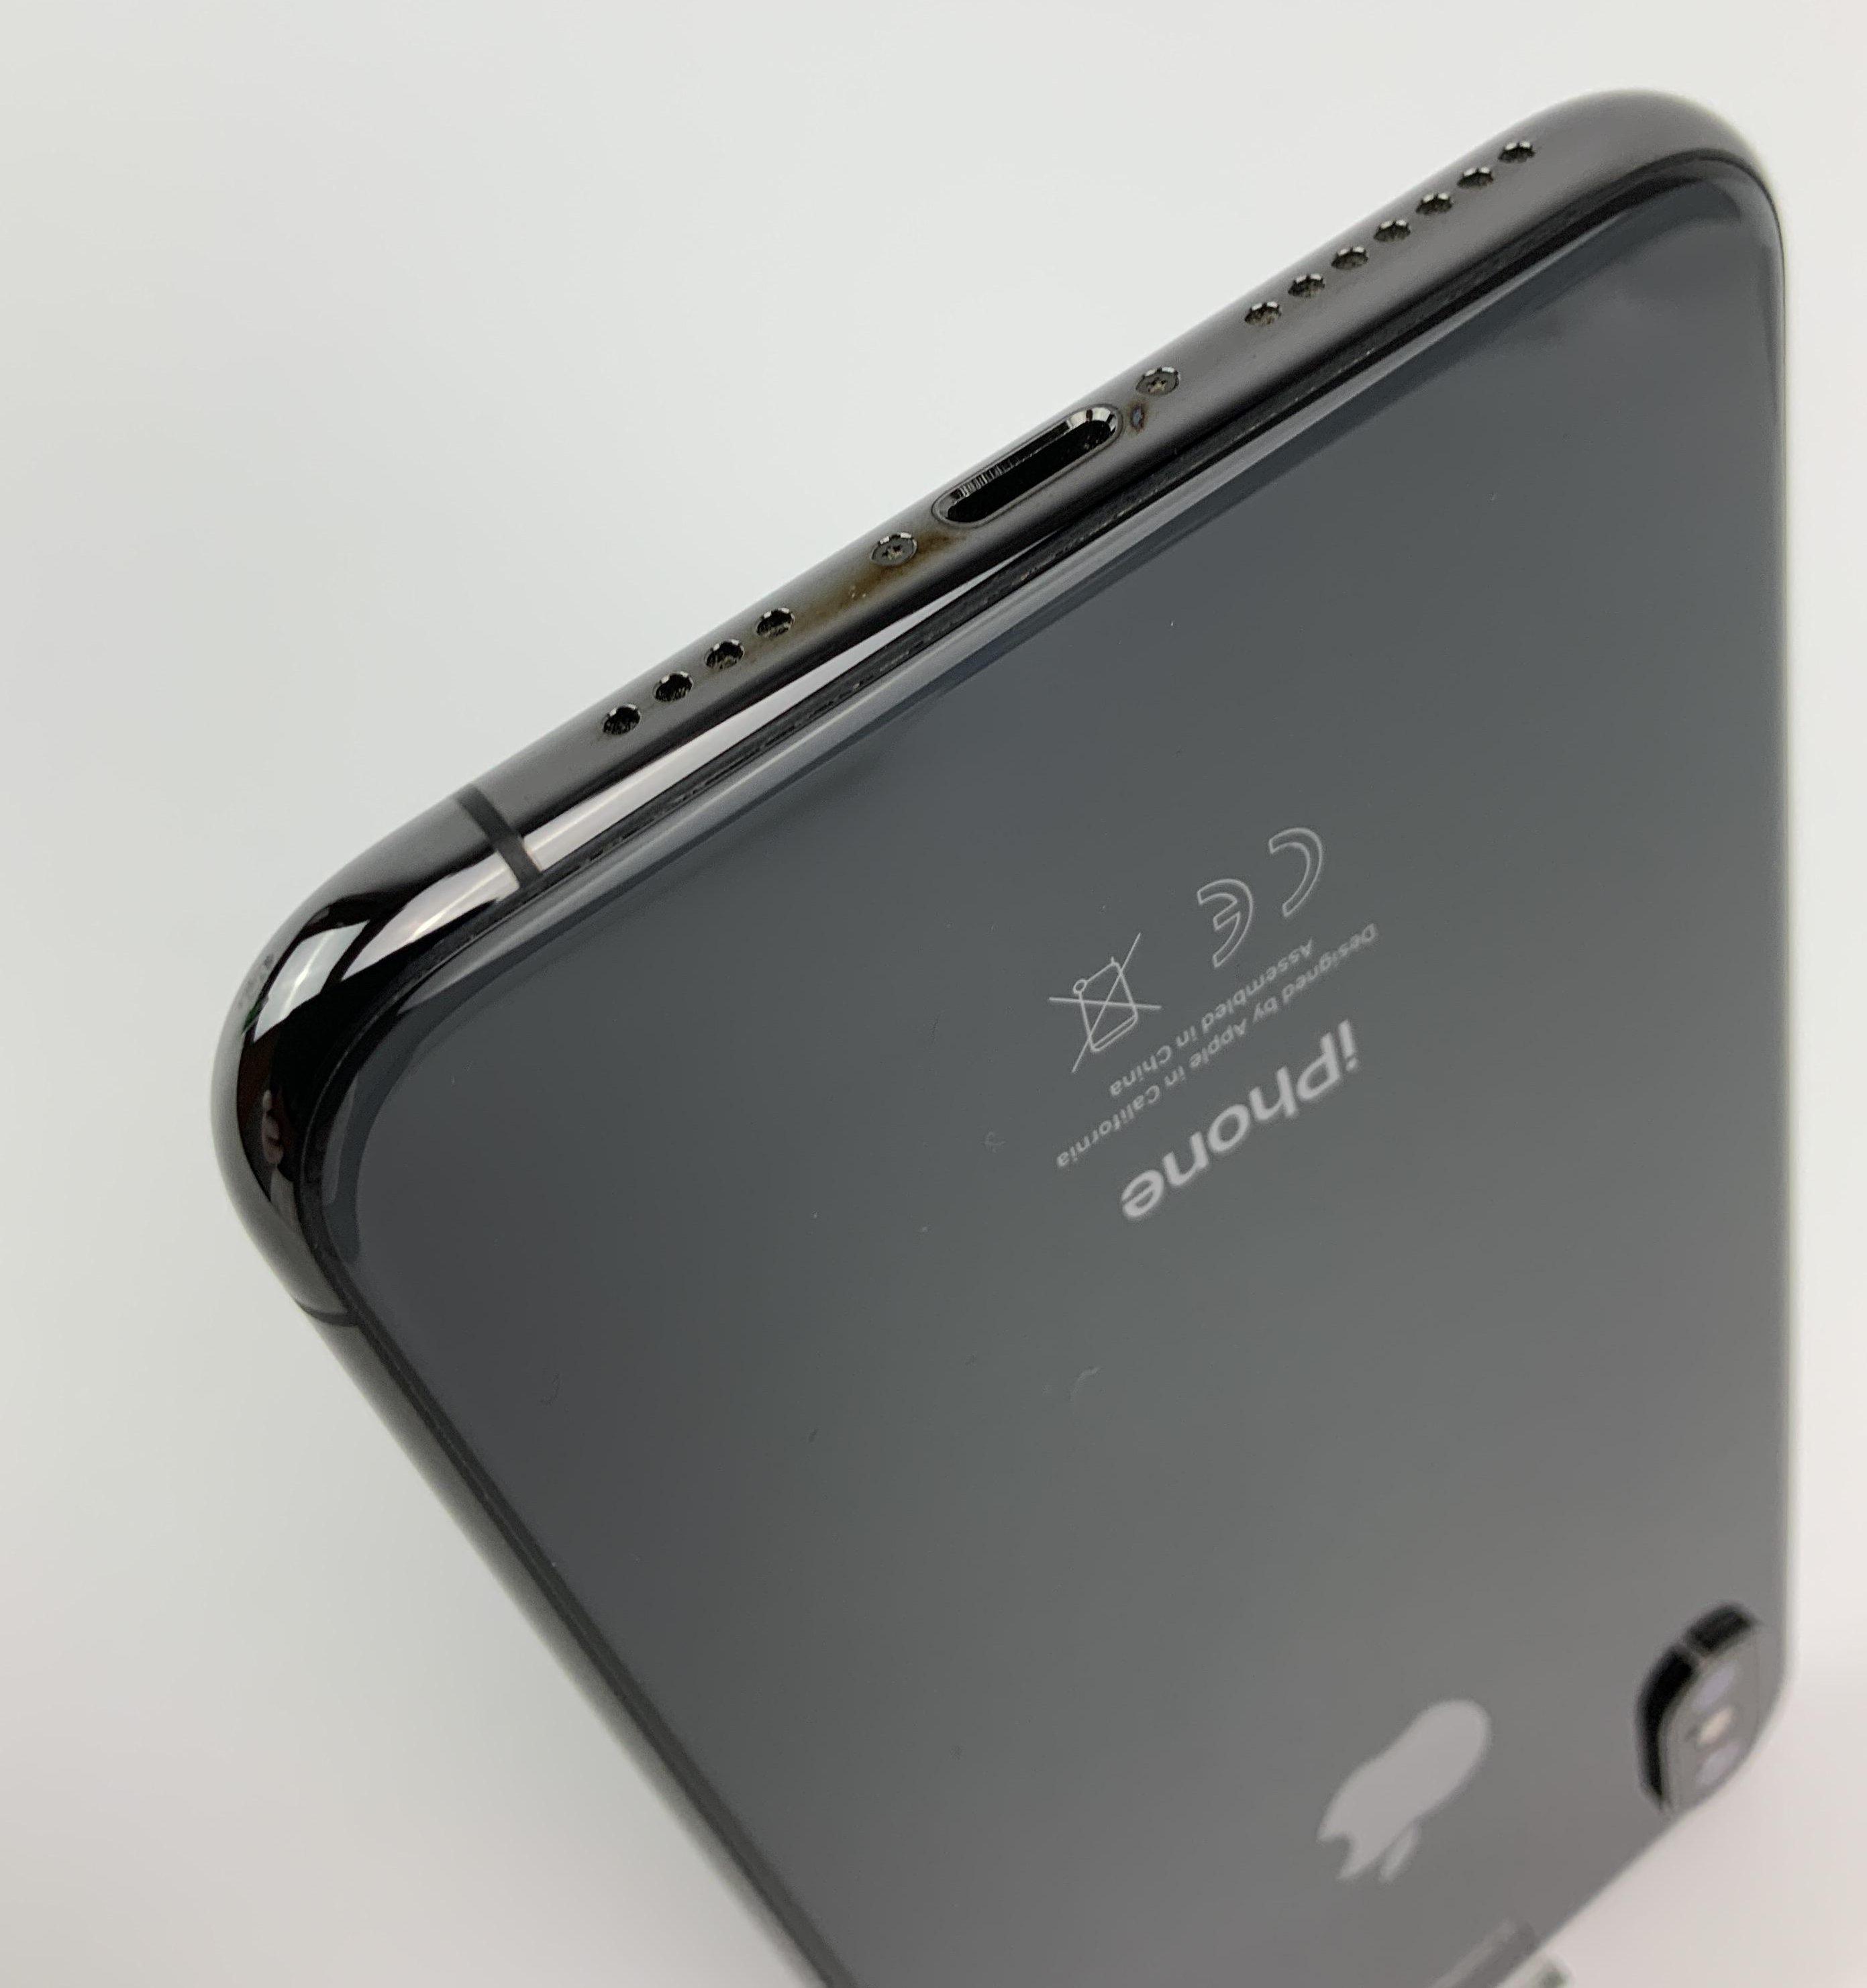 iPhone XS Max 64GB, 64GB, Space Gray, immagine 3